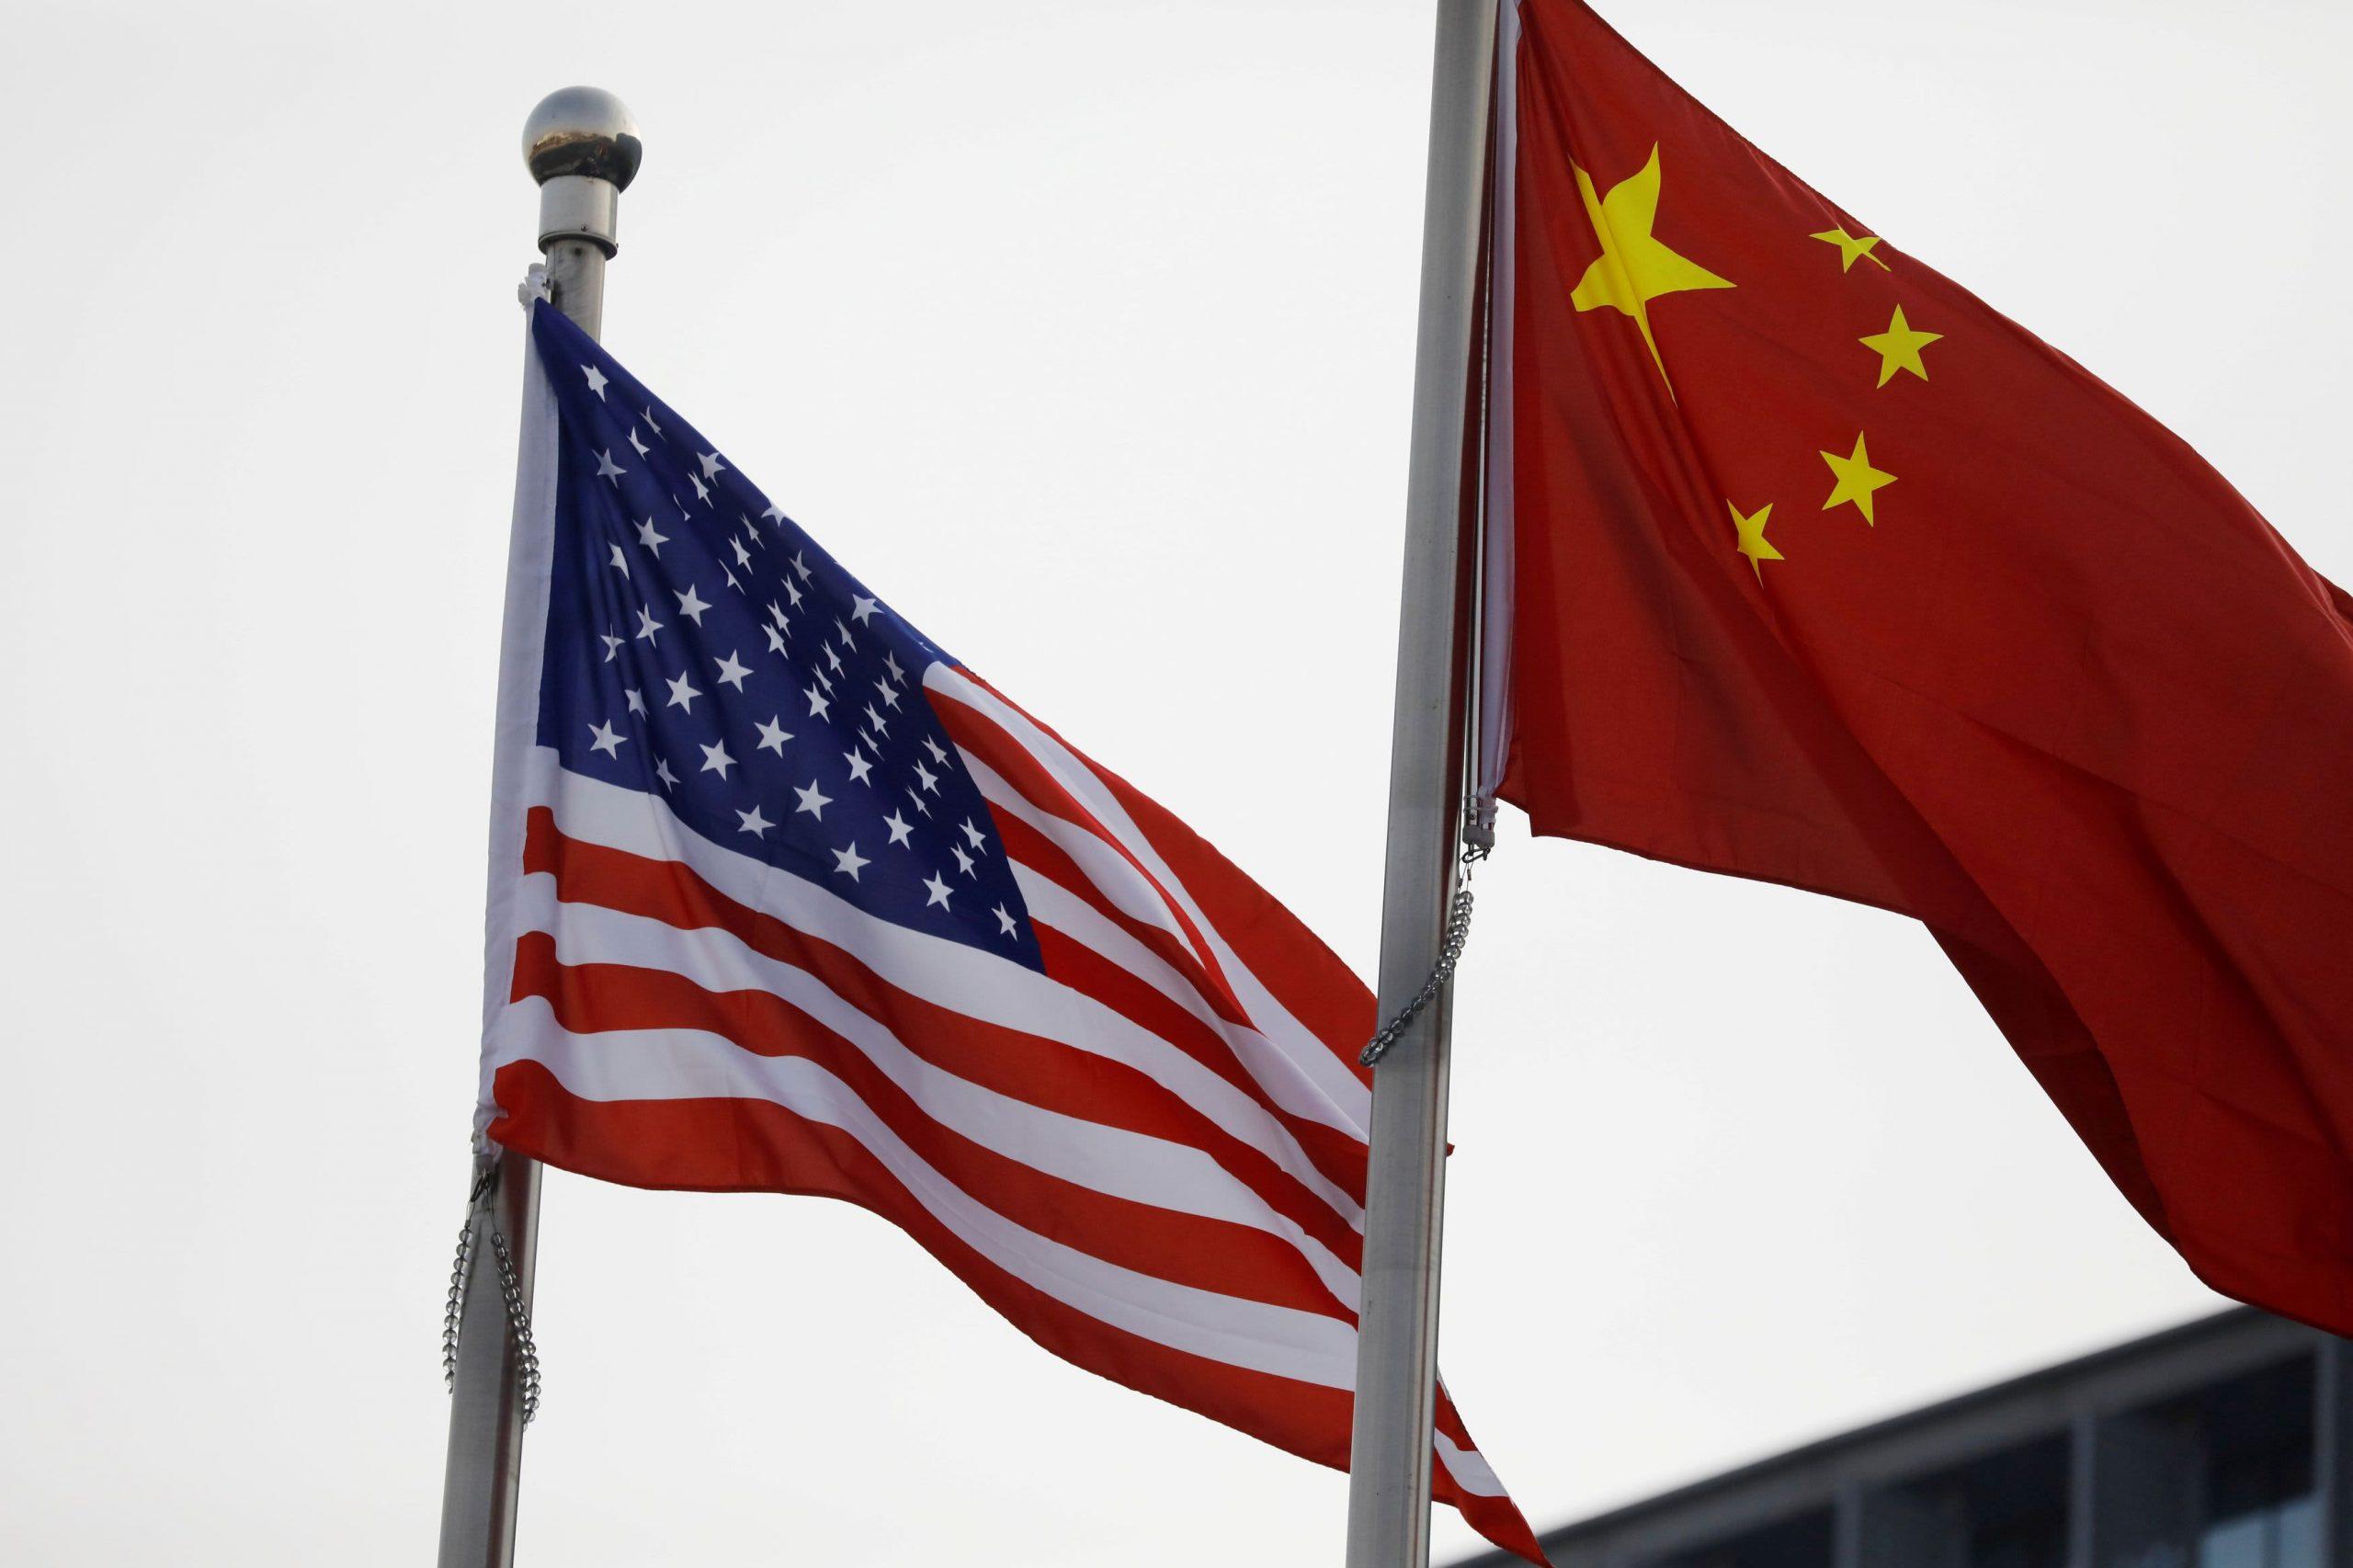 U.S. blacklists 7 Chinese supercomputing entities